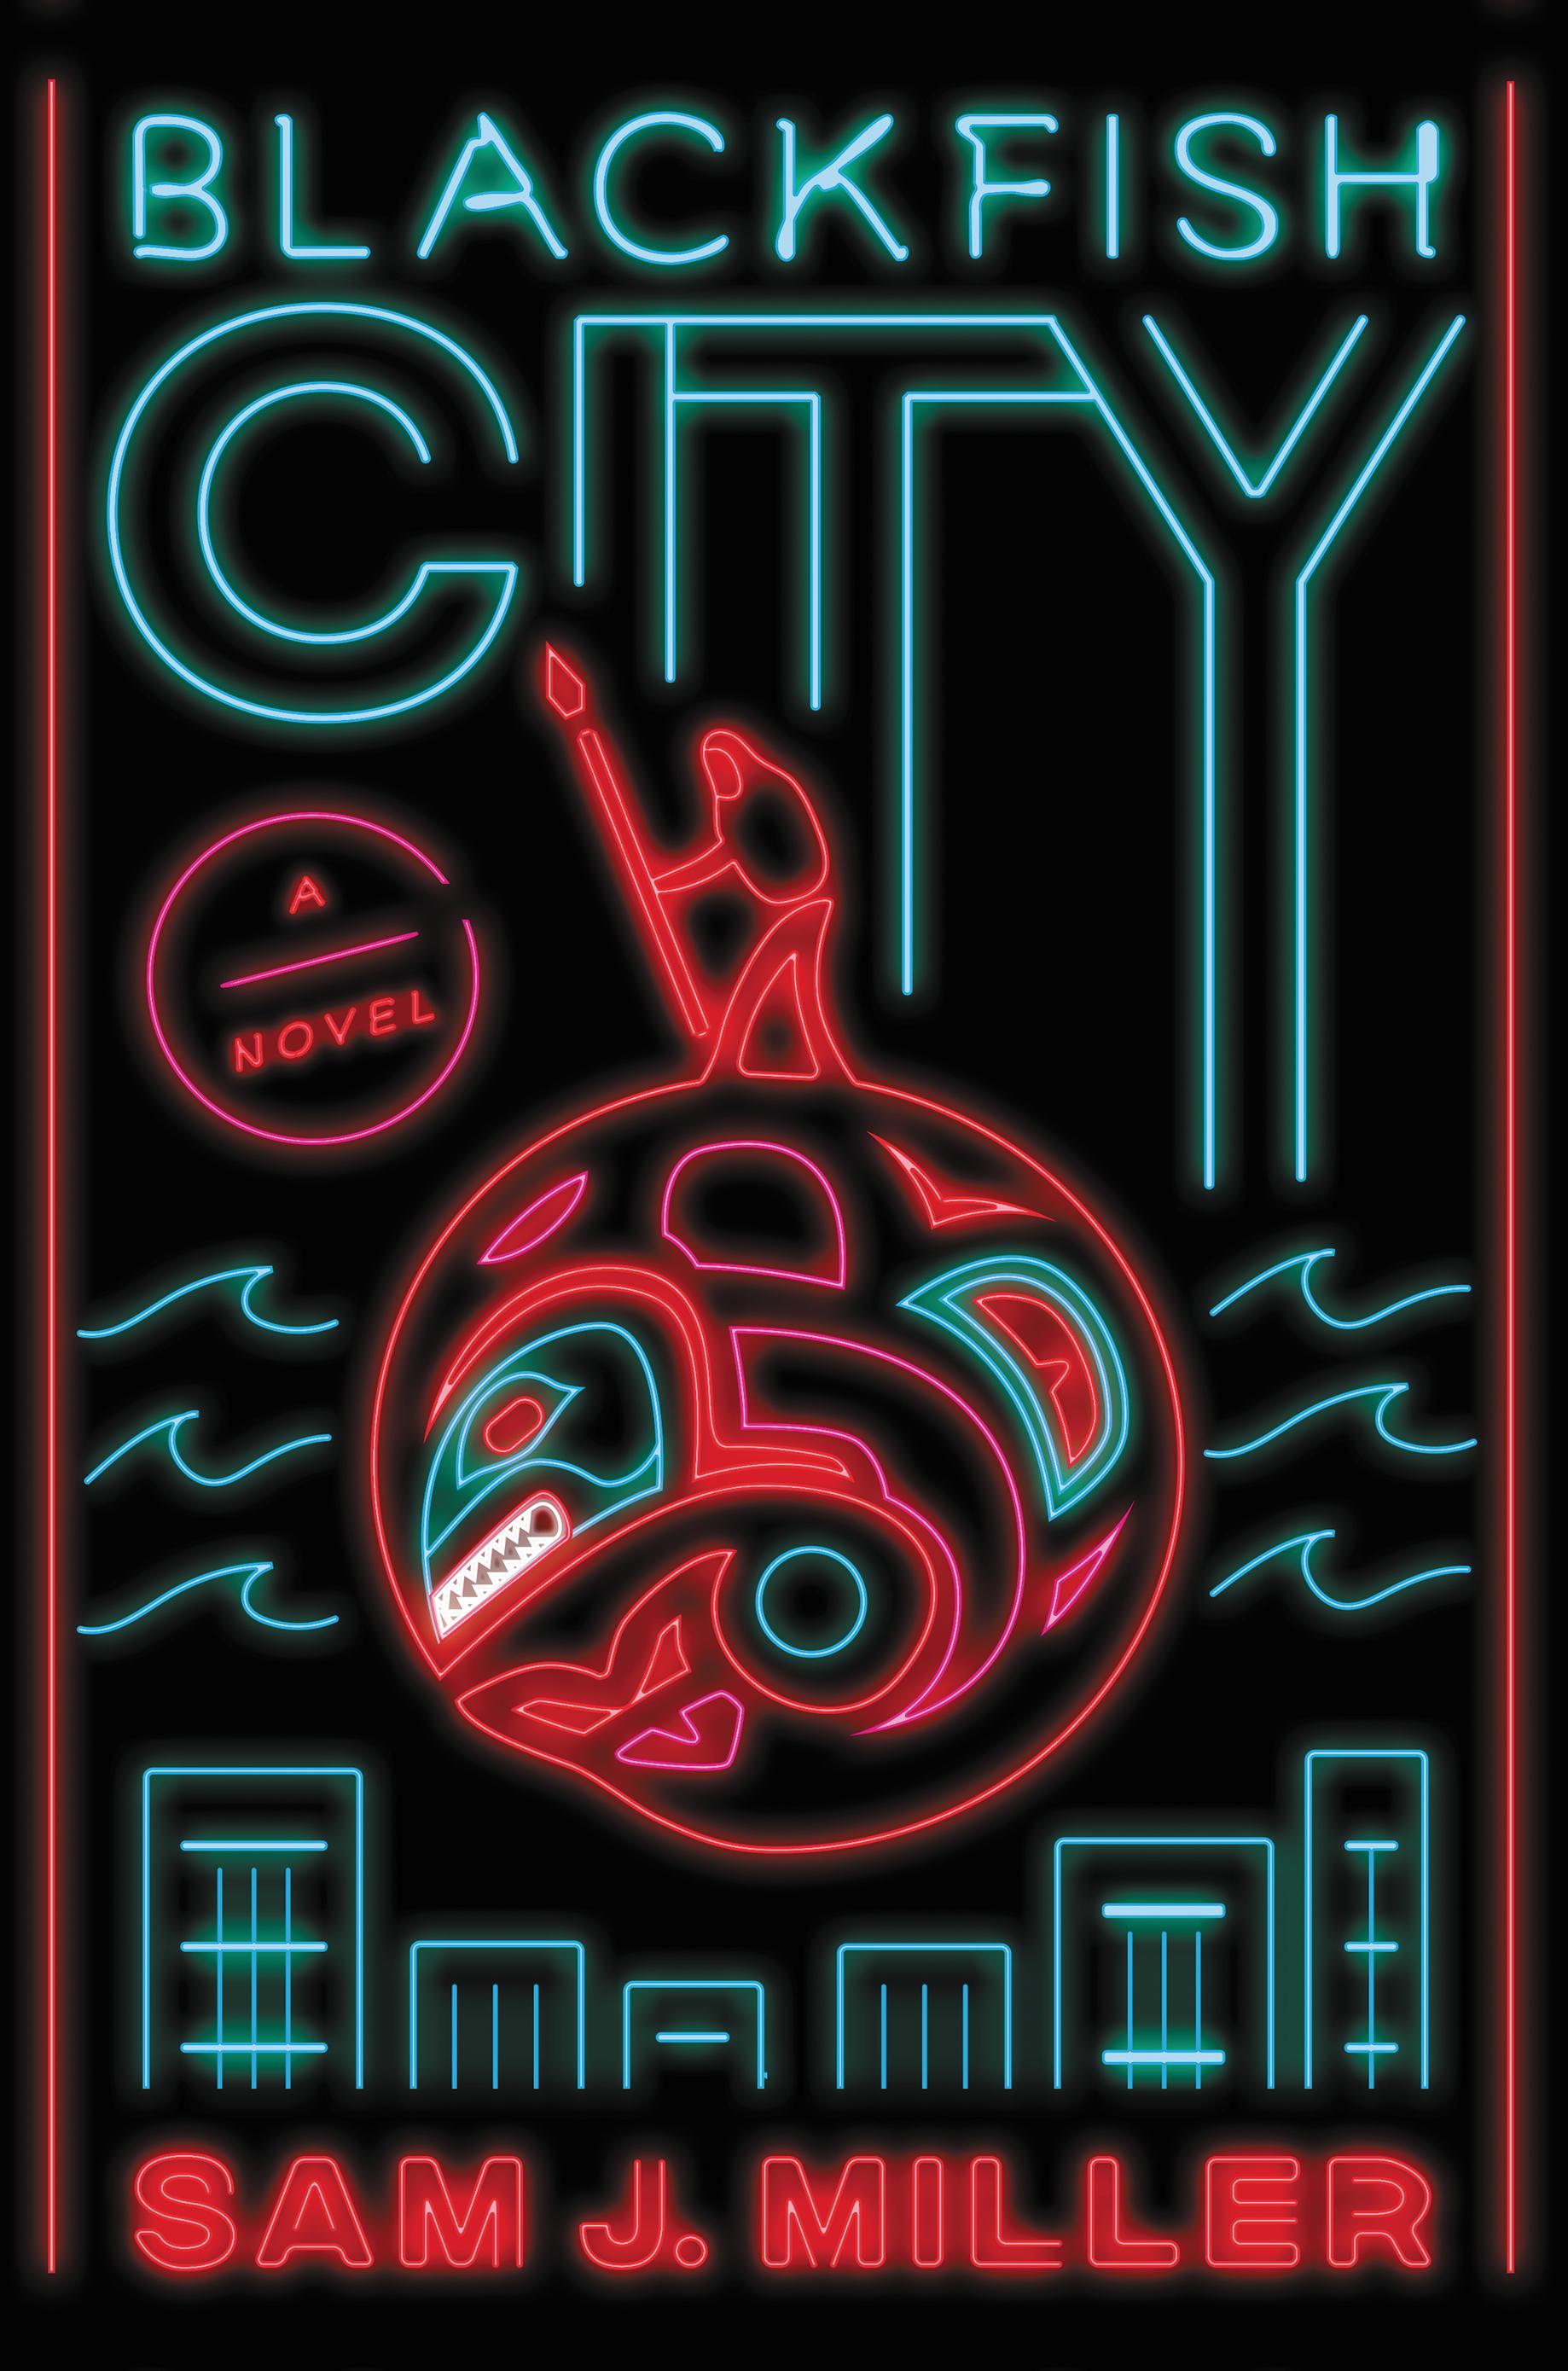 Book Launch: Blackfish City by Sam J. Miller — in conversation w/ N. K. Jemisin